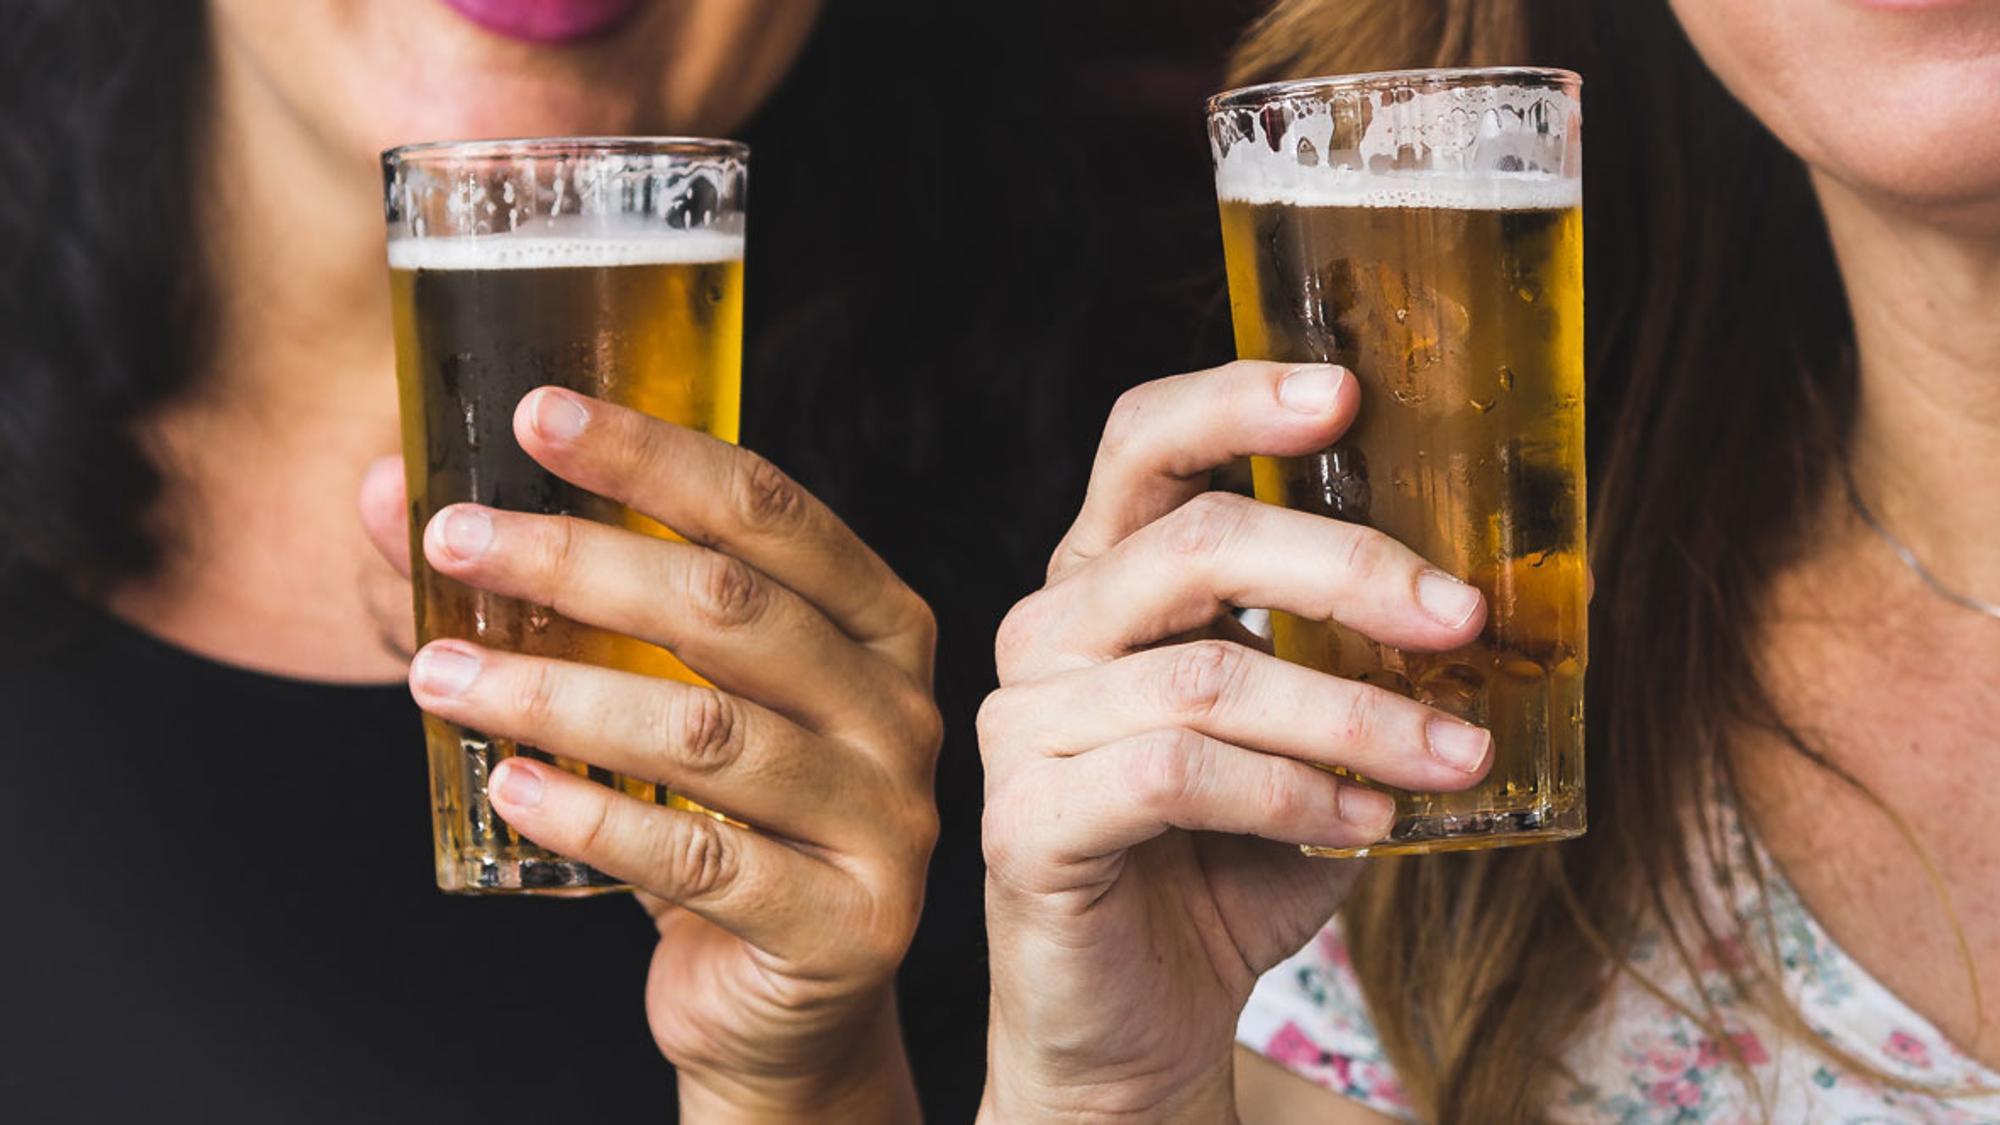 Alkoholfreies Bier in der Schwangerschaft?